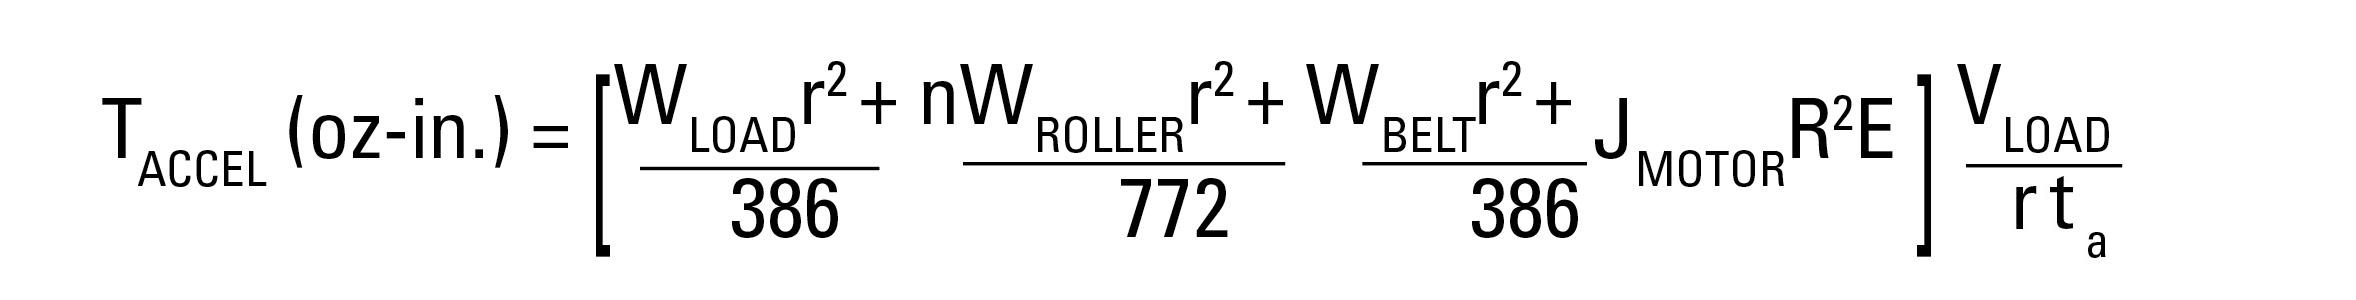 Bodine-gearmotors-for conveyors_formula-T-accel_11-12-2013